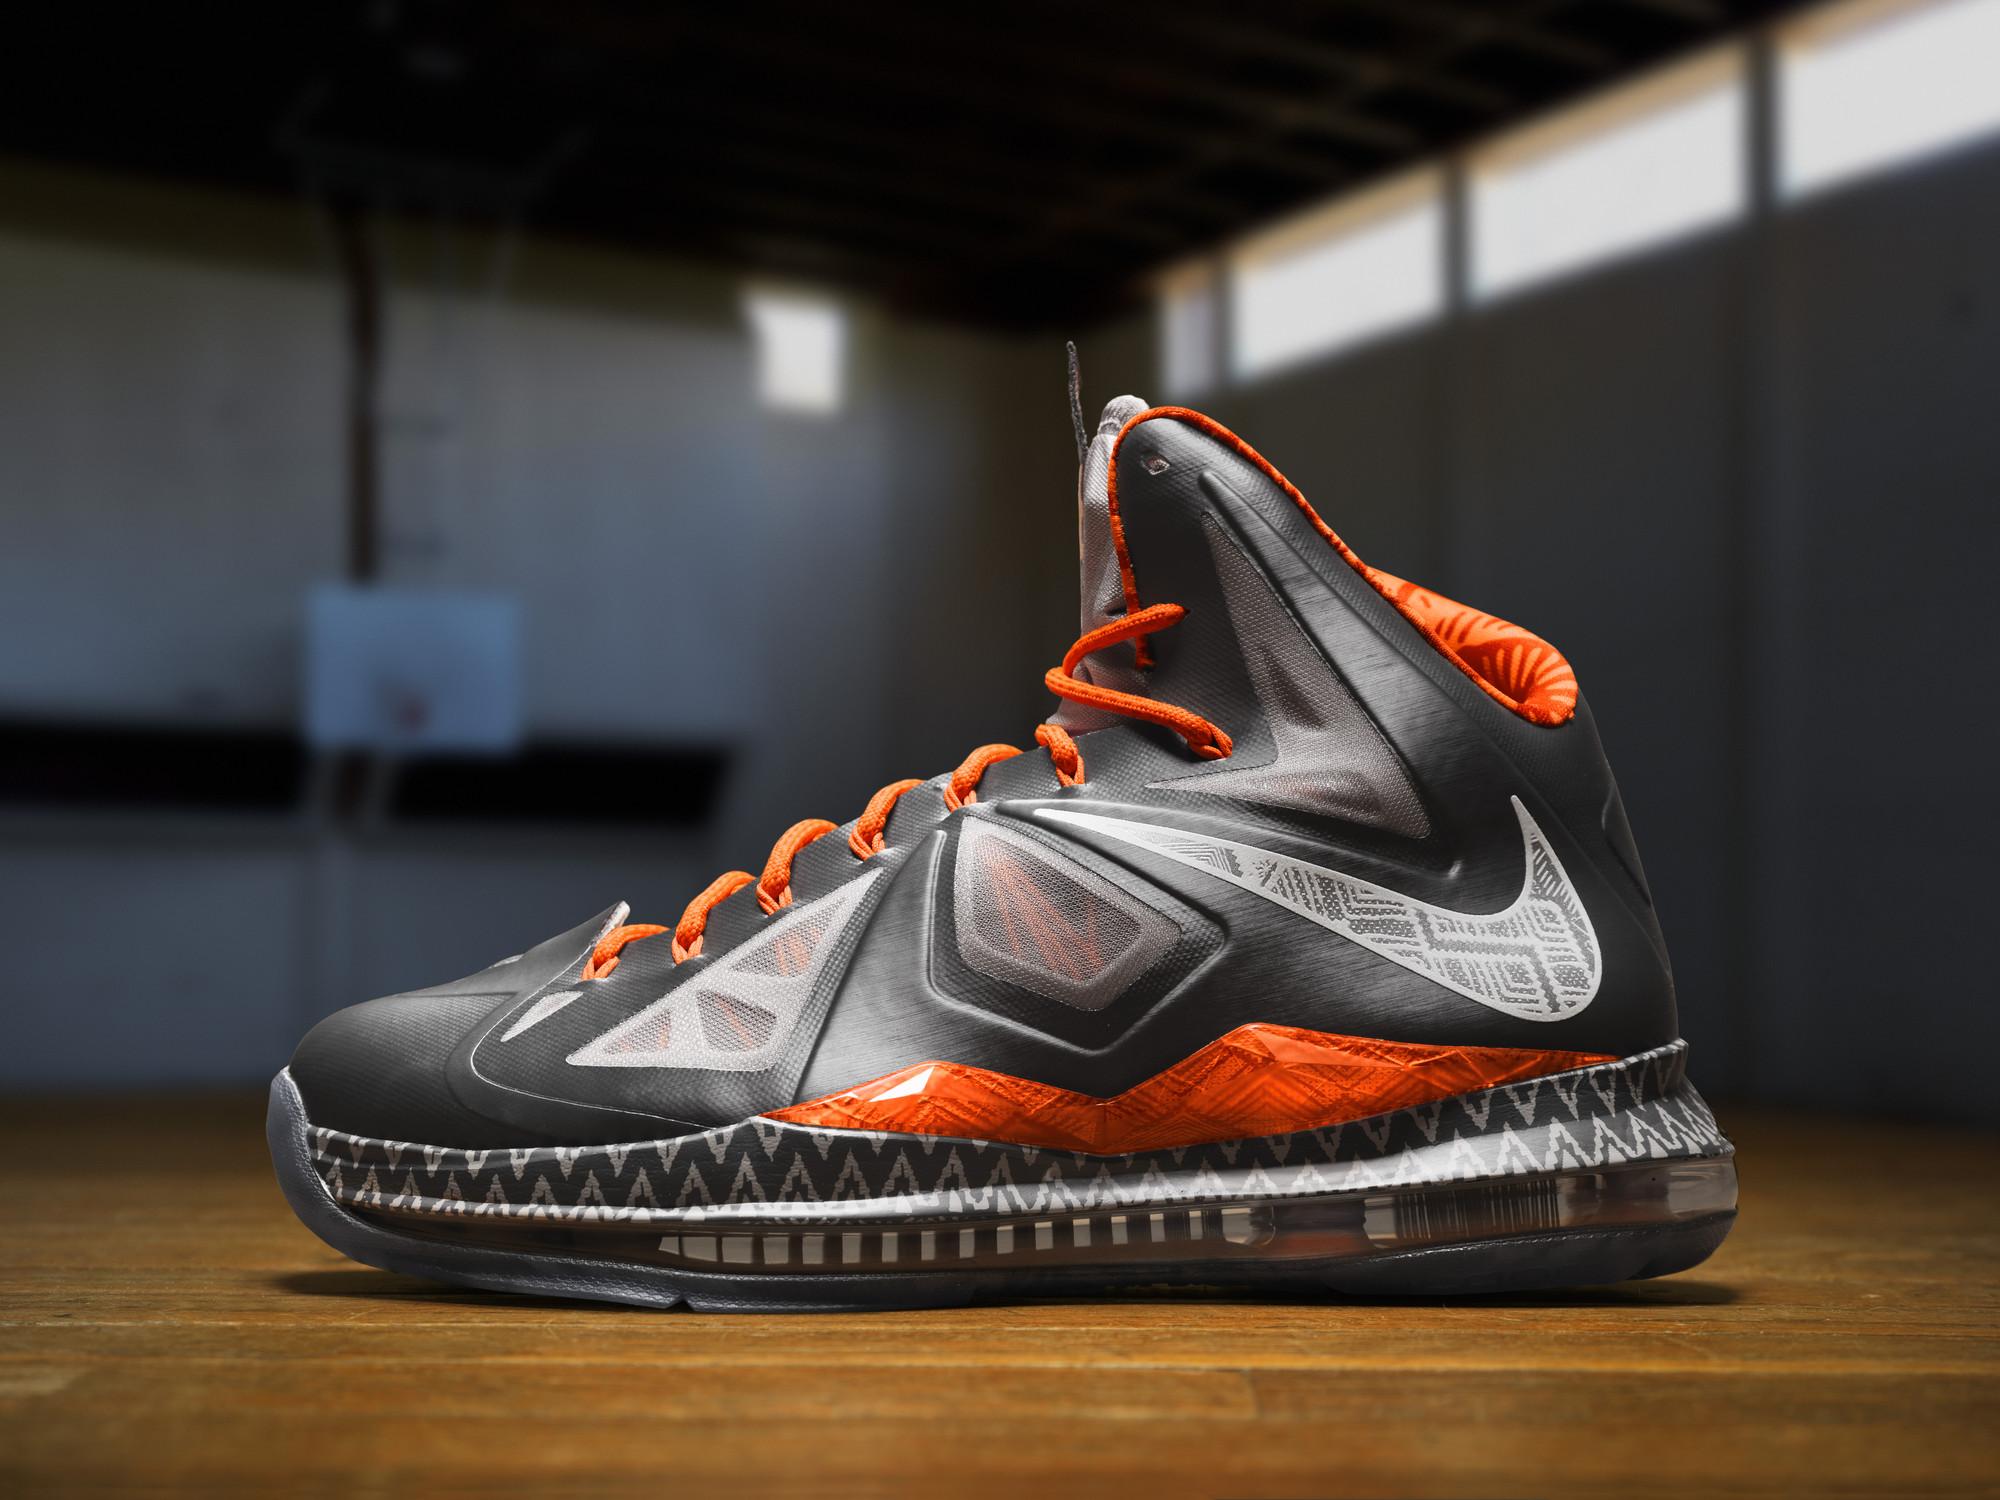 New Arrival 2015 Nike LeBron 10 BHM Black History Month